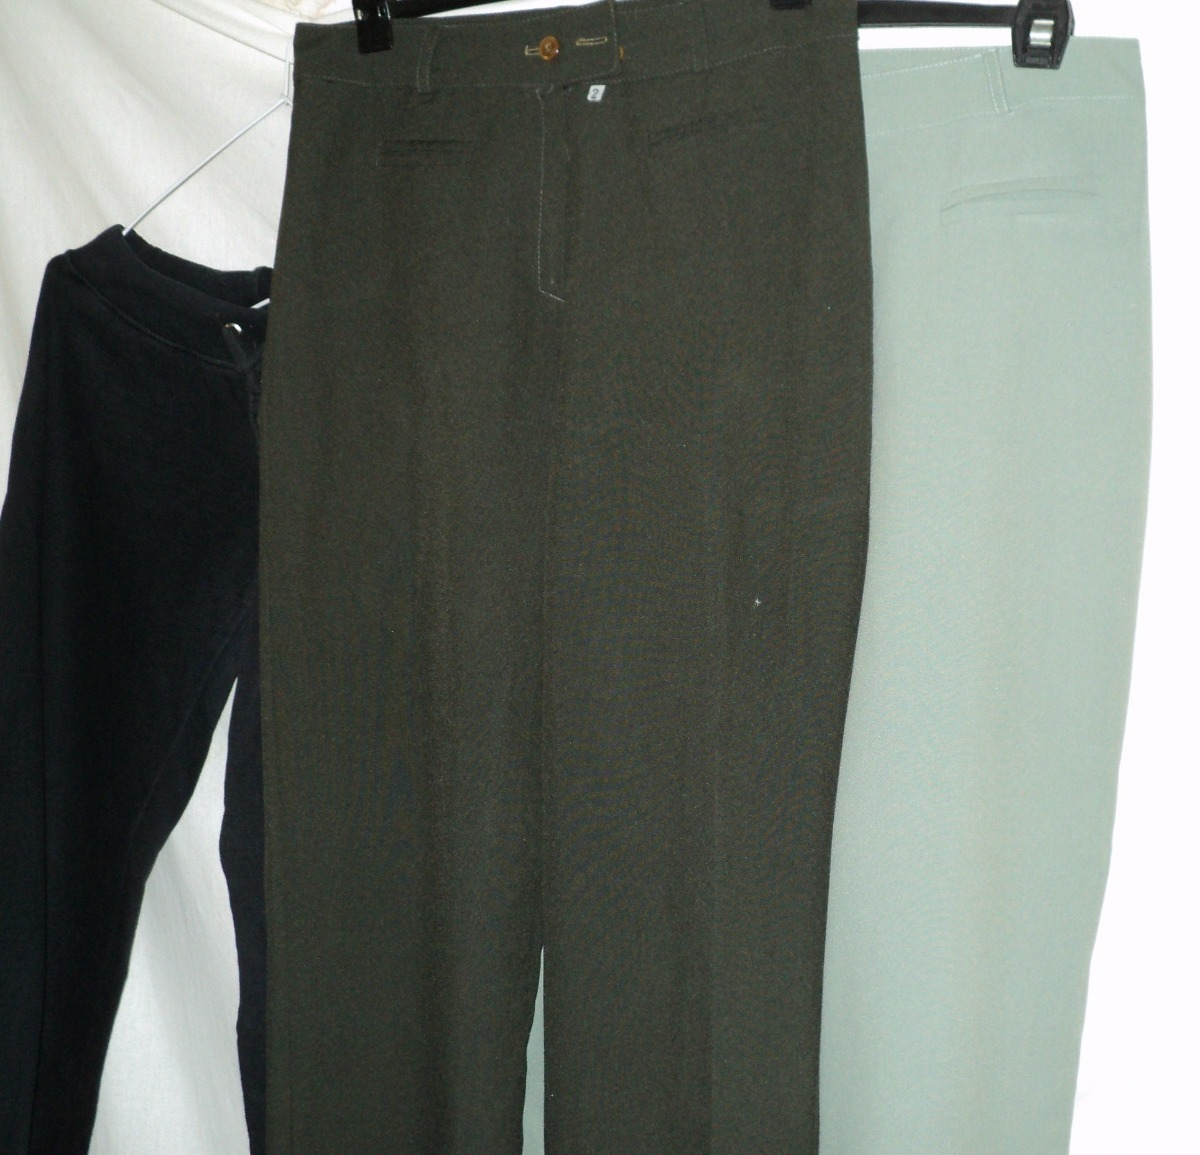 en 2 pantalon y jogging poliester 2 mujer vestir zoom Cargando lote talle  8qqwgS 7e847d2241eb